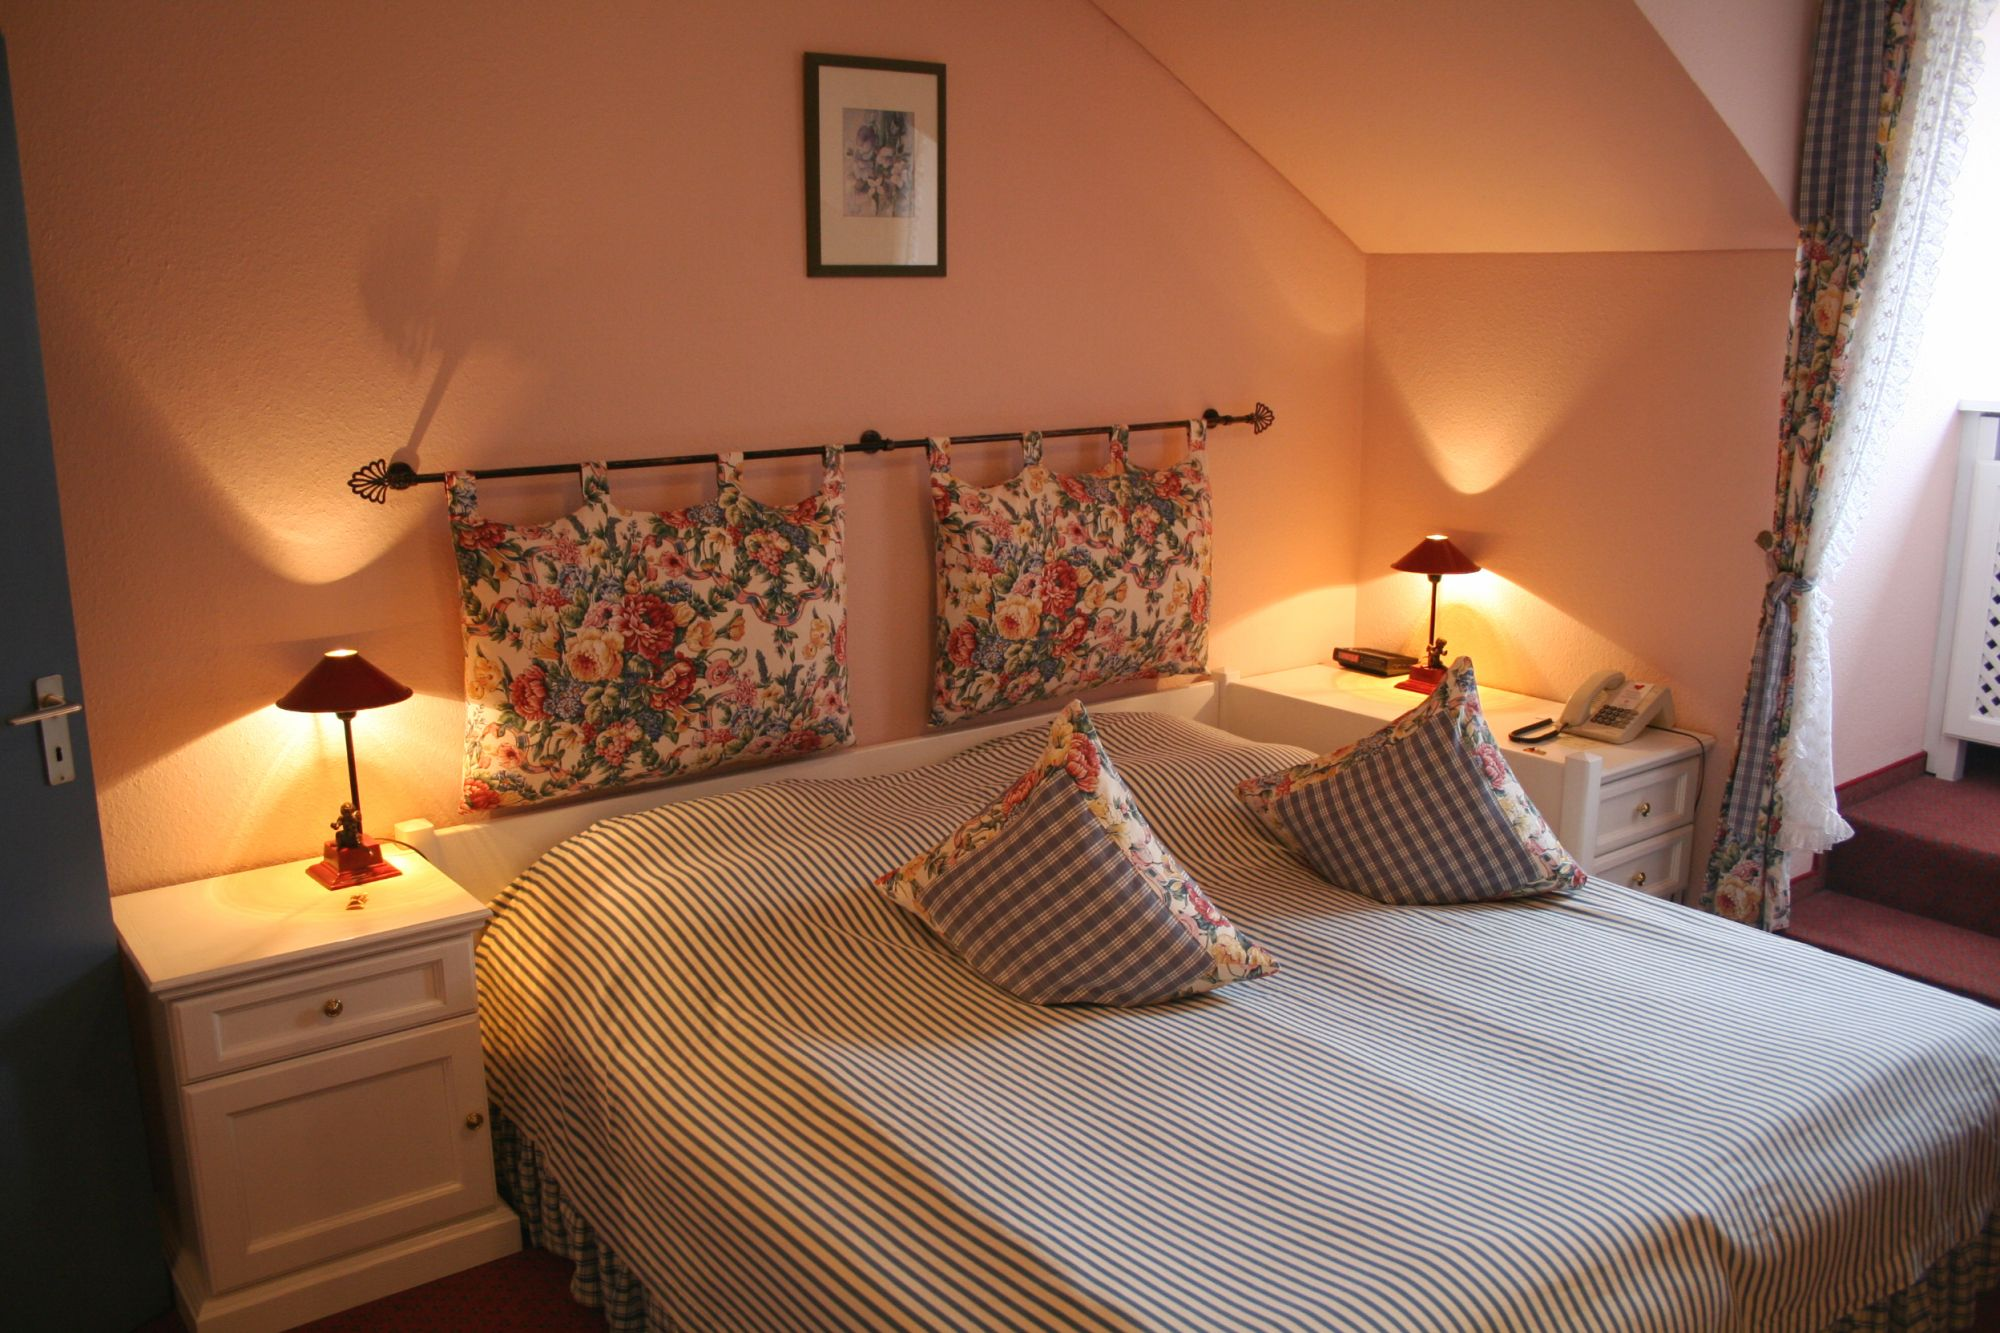 bad griesbach hotels buchung online bayerischen b derdreieck. Black Bedroom Furniture Sets. Home Design Ideas